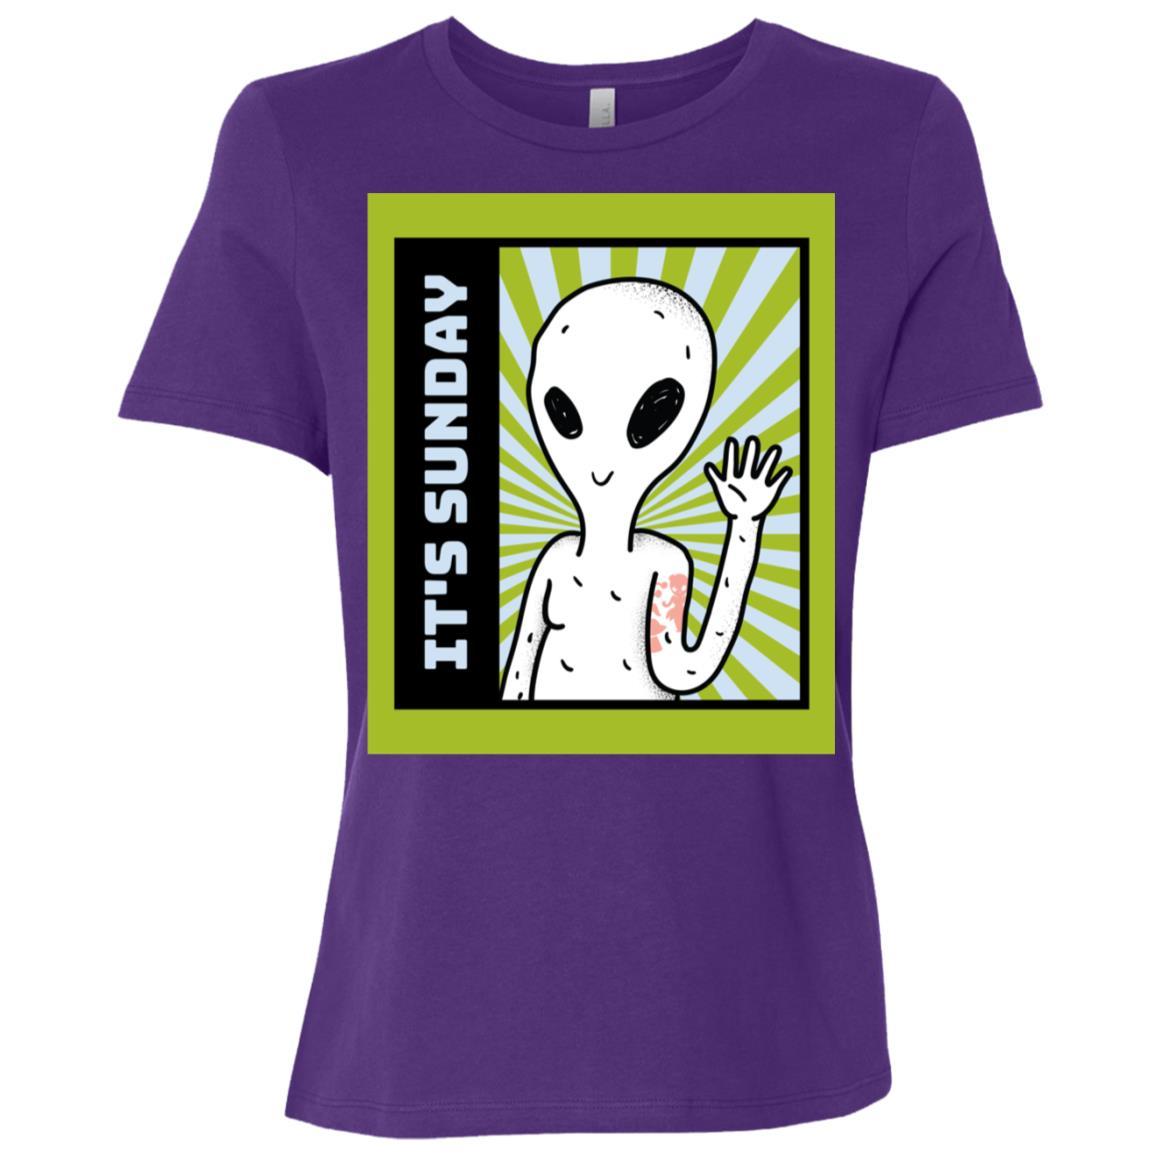 Funny It's Sunday Green Alien gift idea Women Short Sleeve T-Shirt